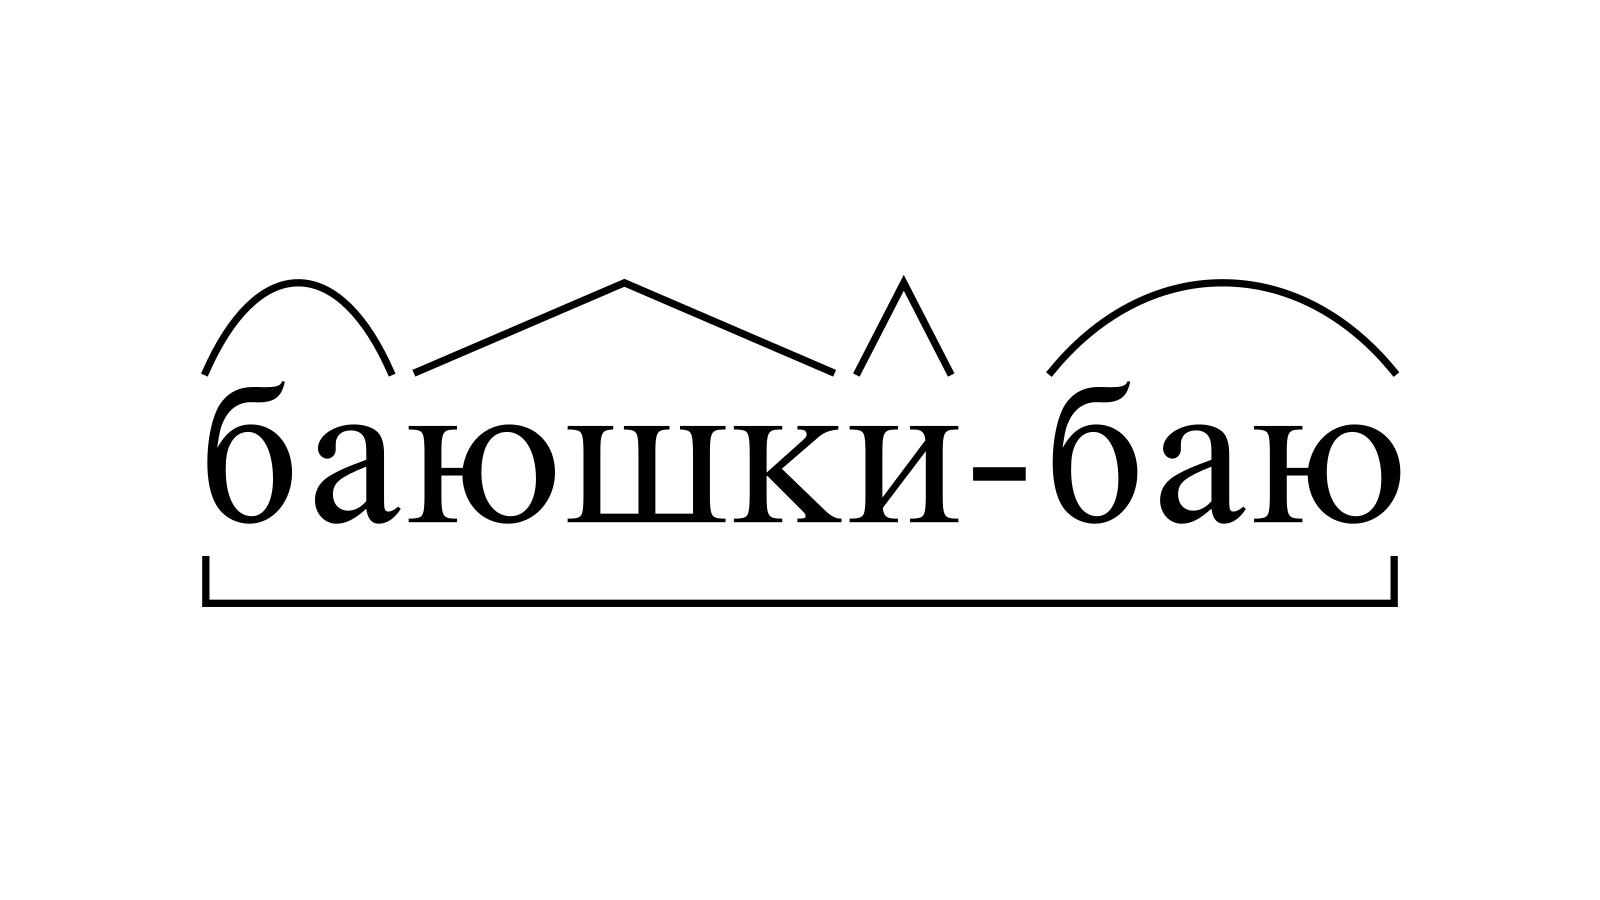 Разбор слова «баюшки-баю» по составу